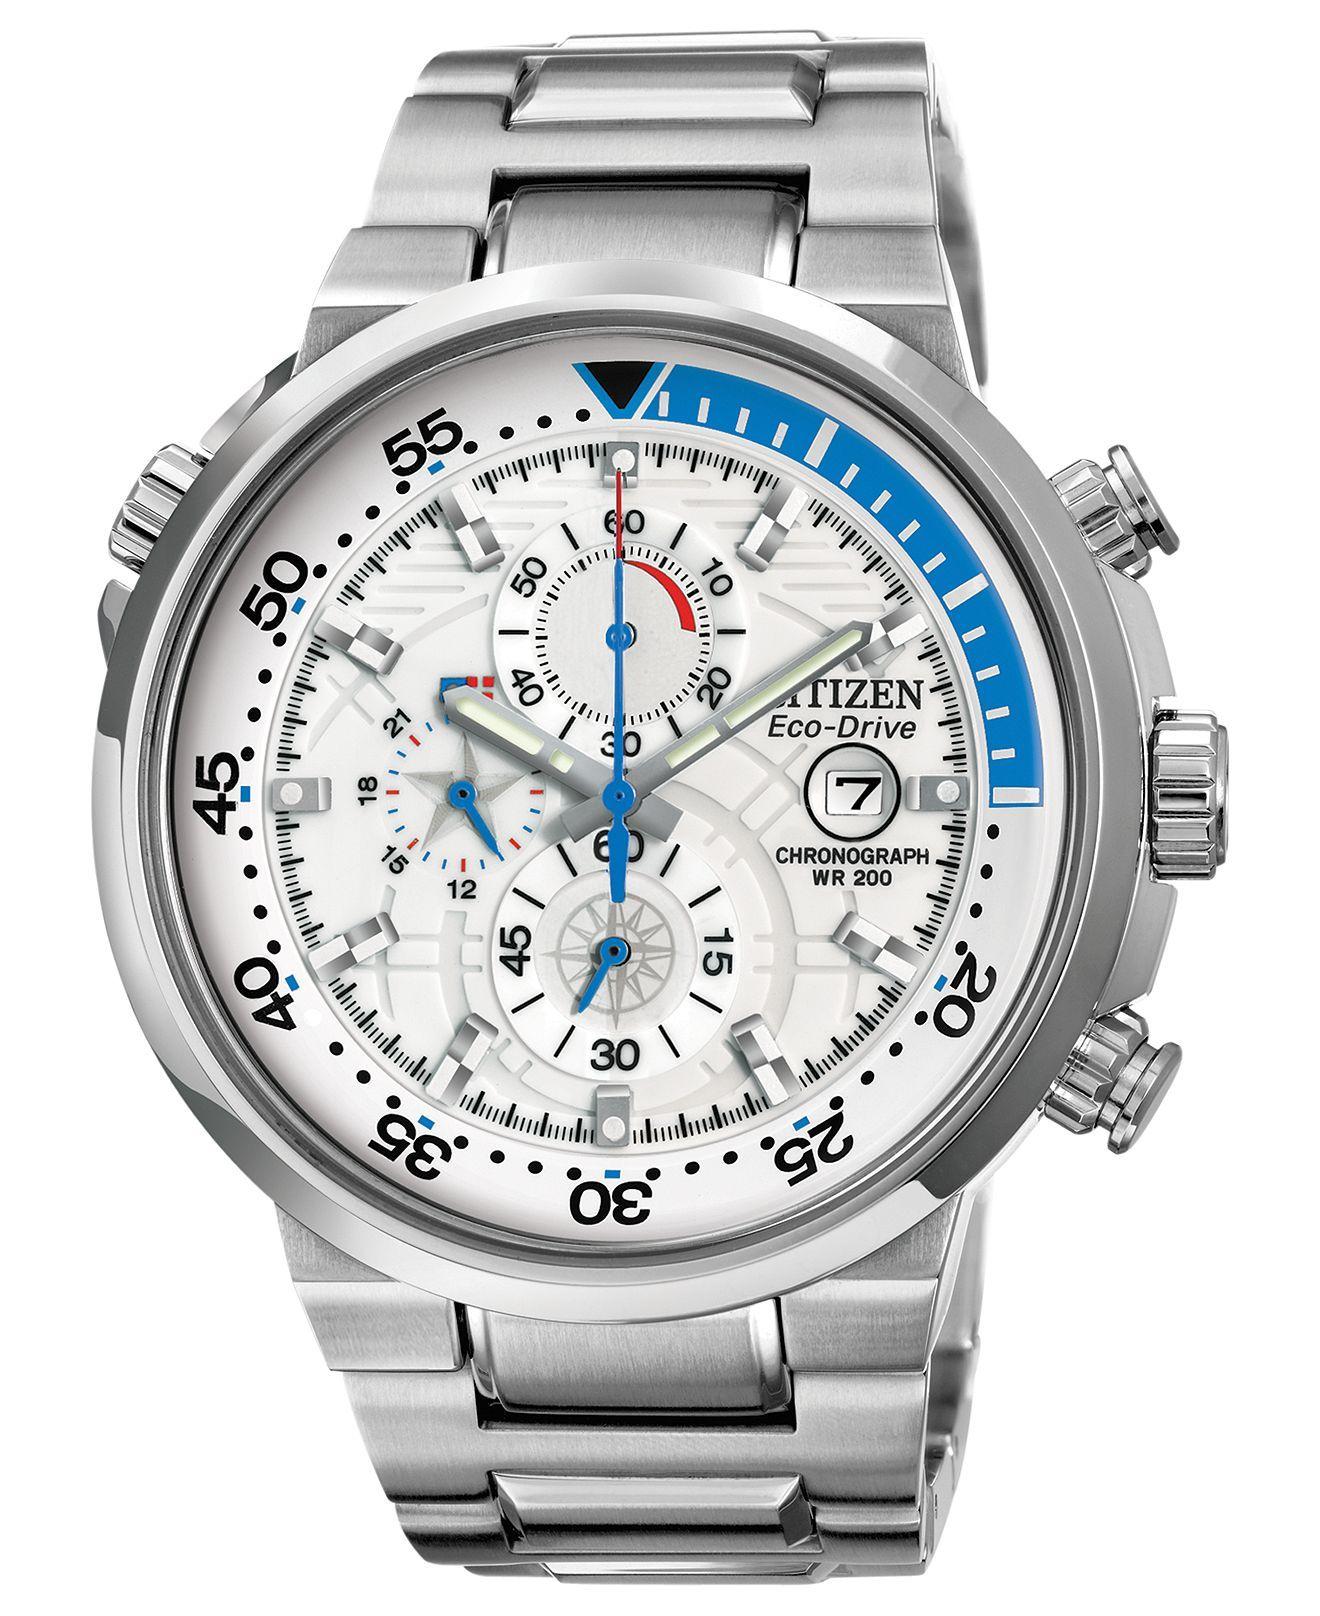 citizen watch mens chronograph eco drive endeavor stainless steel citizen watch mens chronograph eco drive endeavor stainless steel bracelet 46mm ca0440 51a